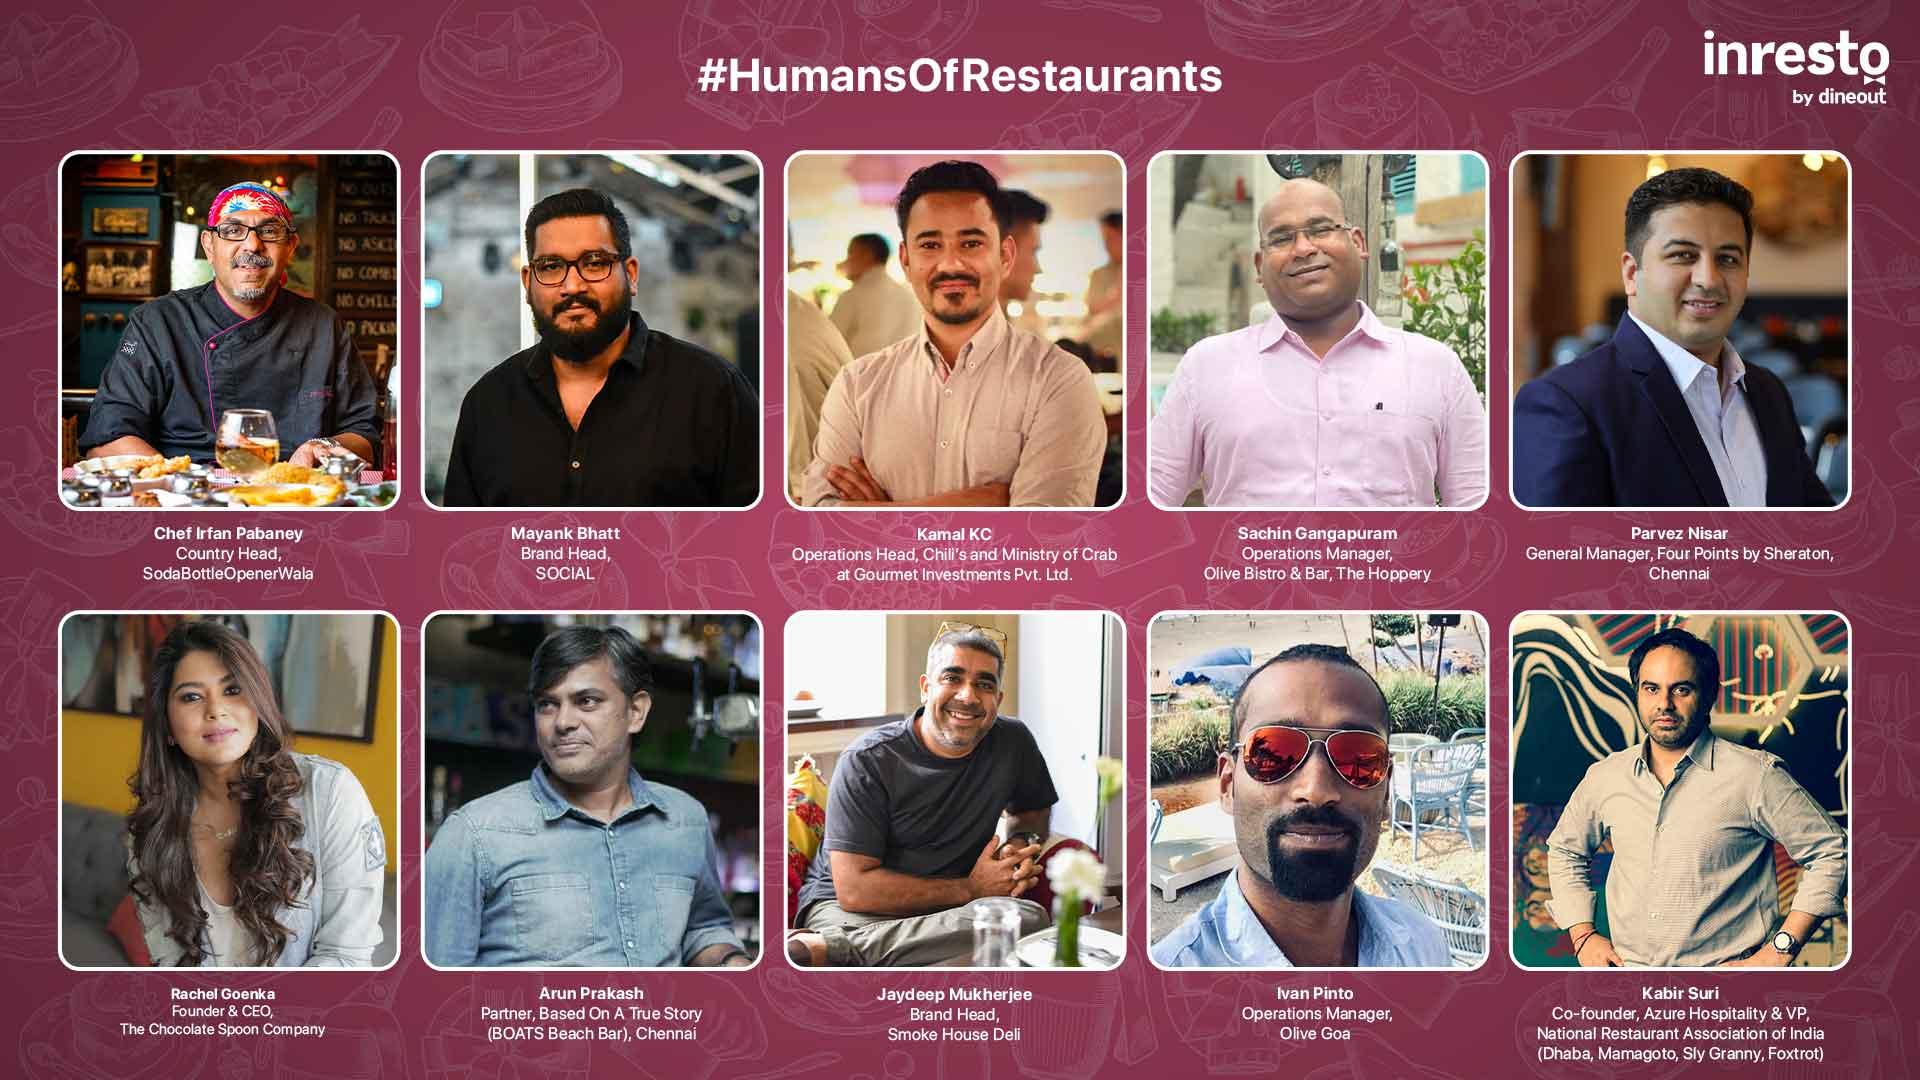 #HumansOfRestaurants: Inspirational anecdotes of restaurateurs sailing through tough times